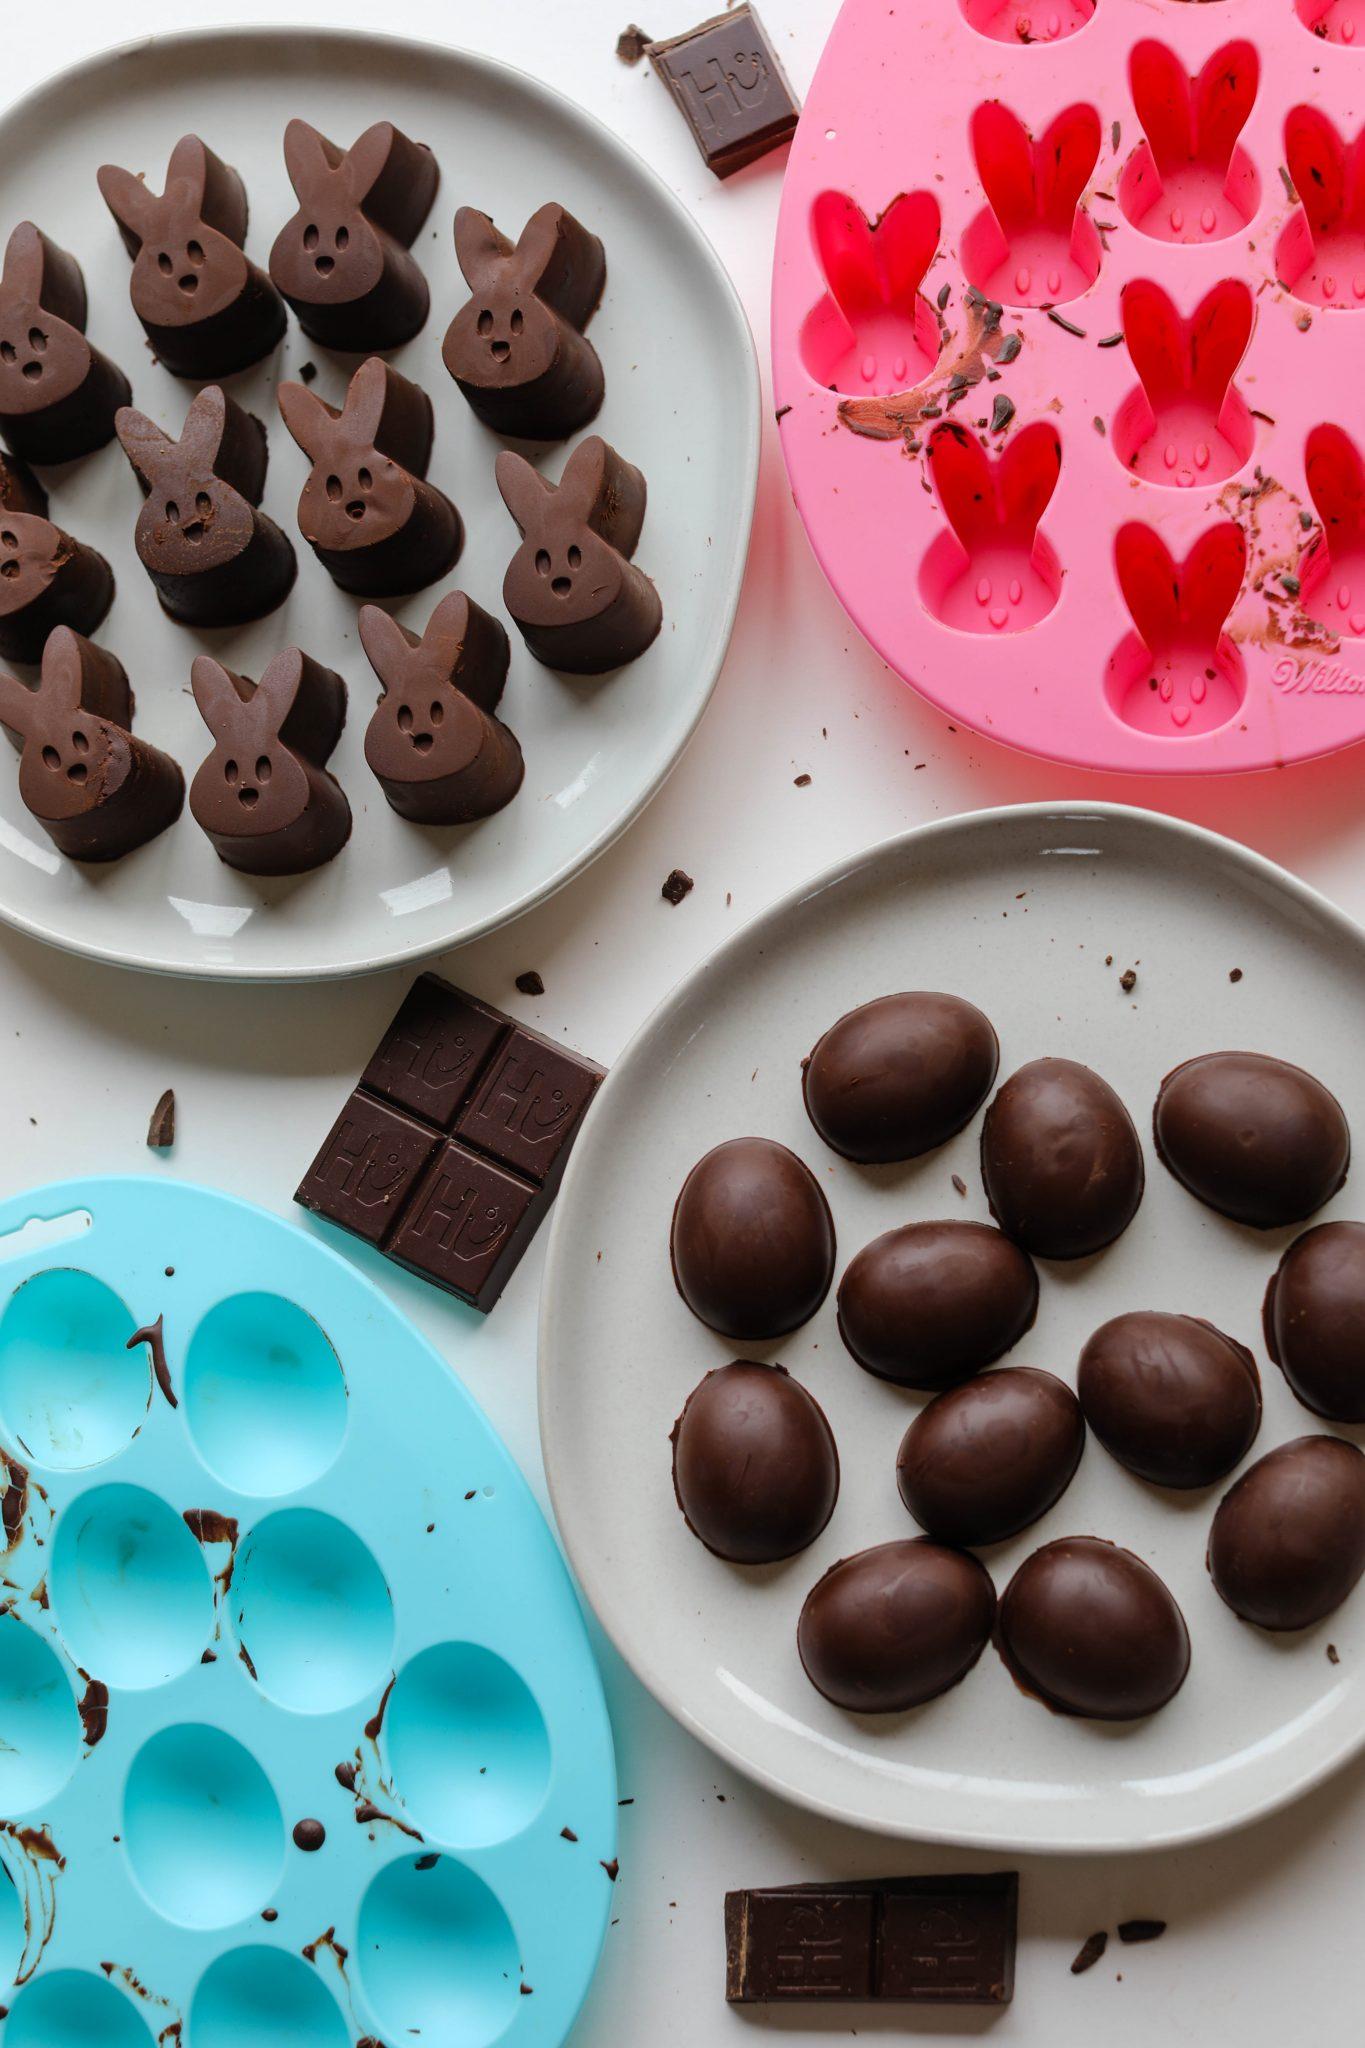 Homemade Vegan Chocolate Bunnies & Eggs by Flora & Vino